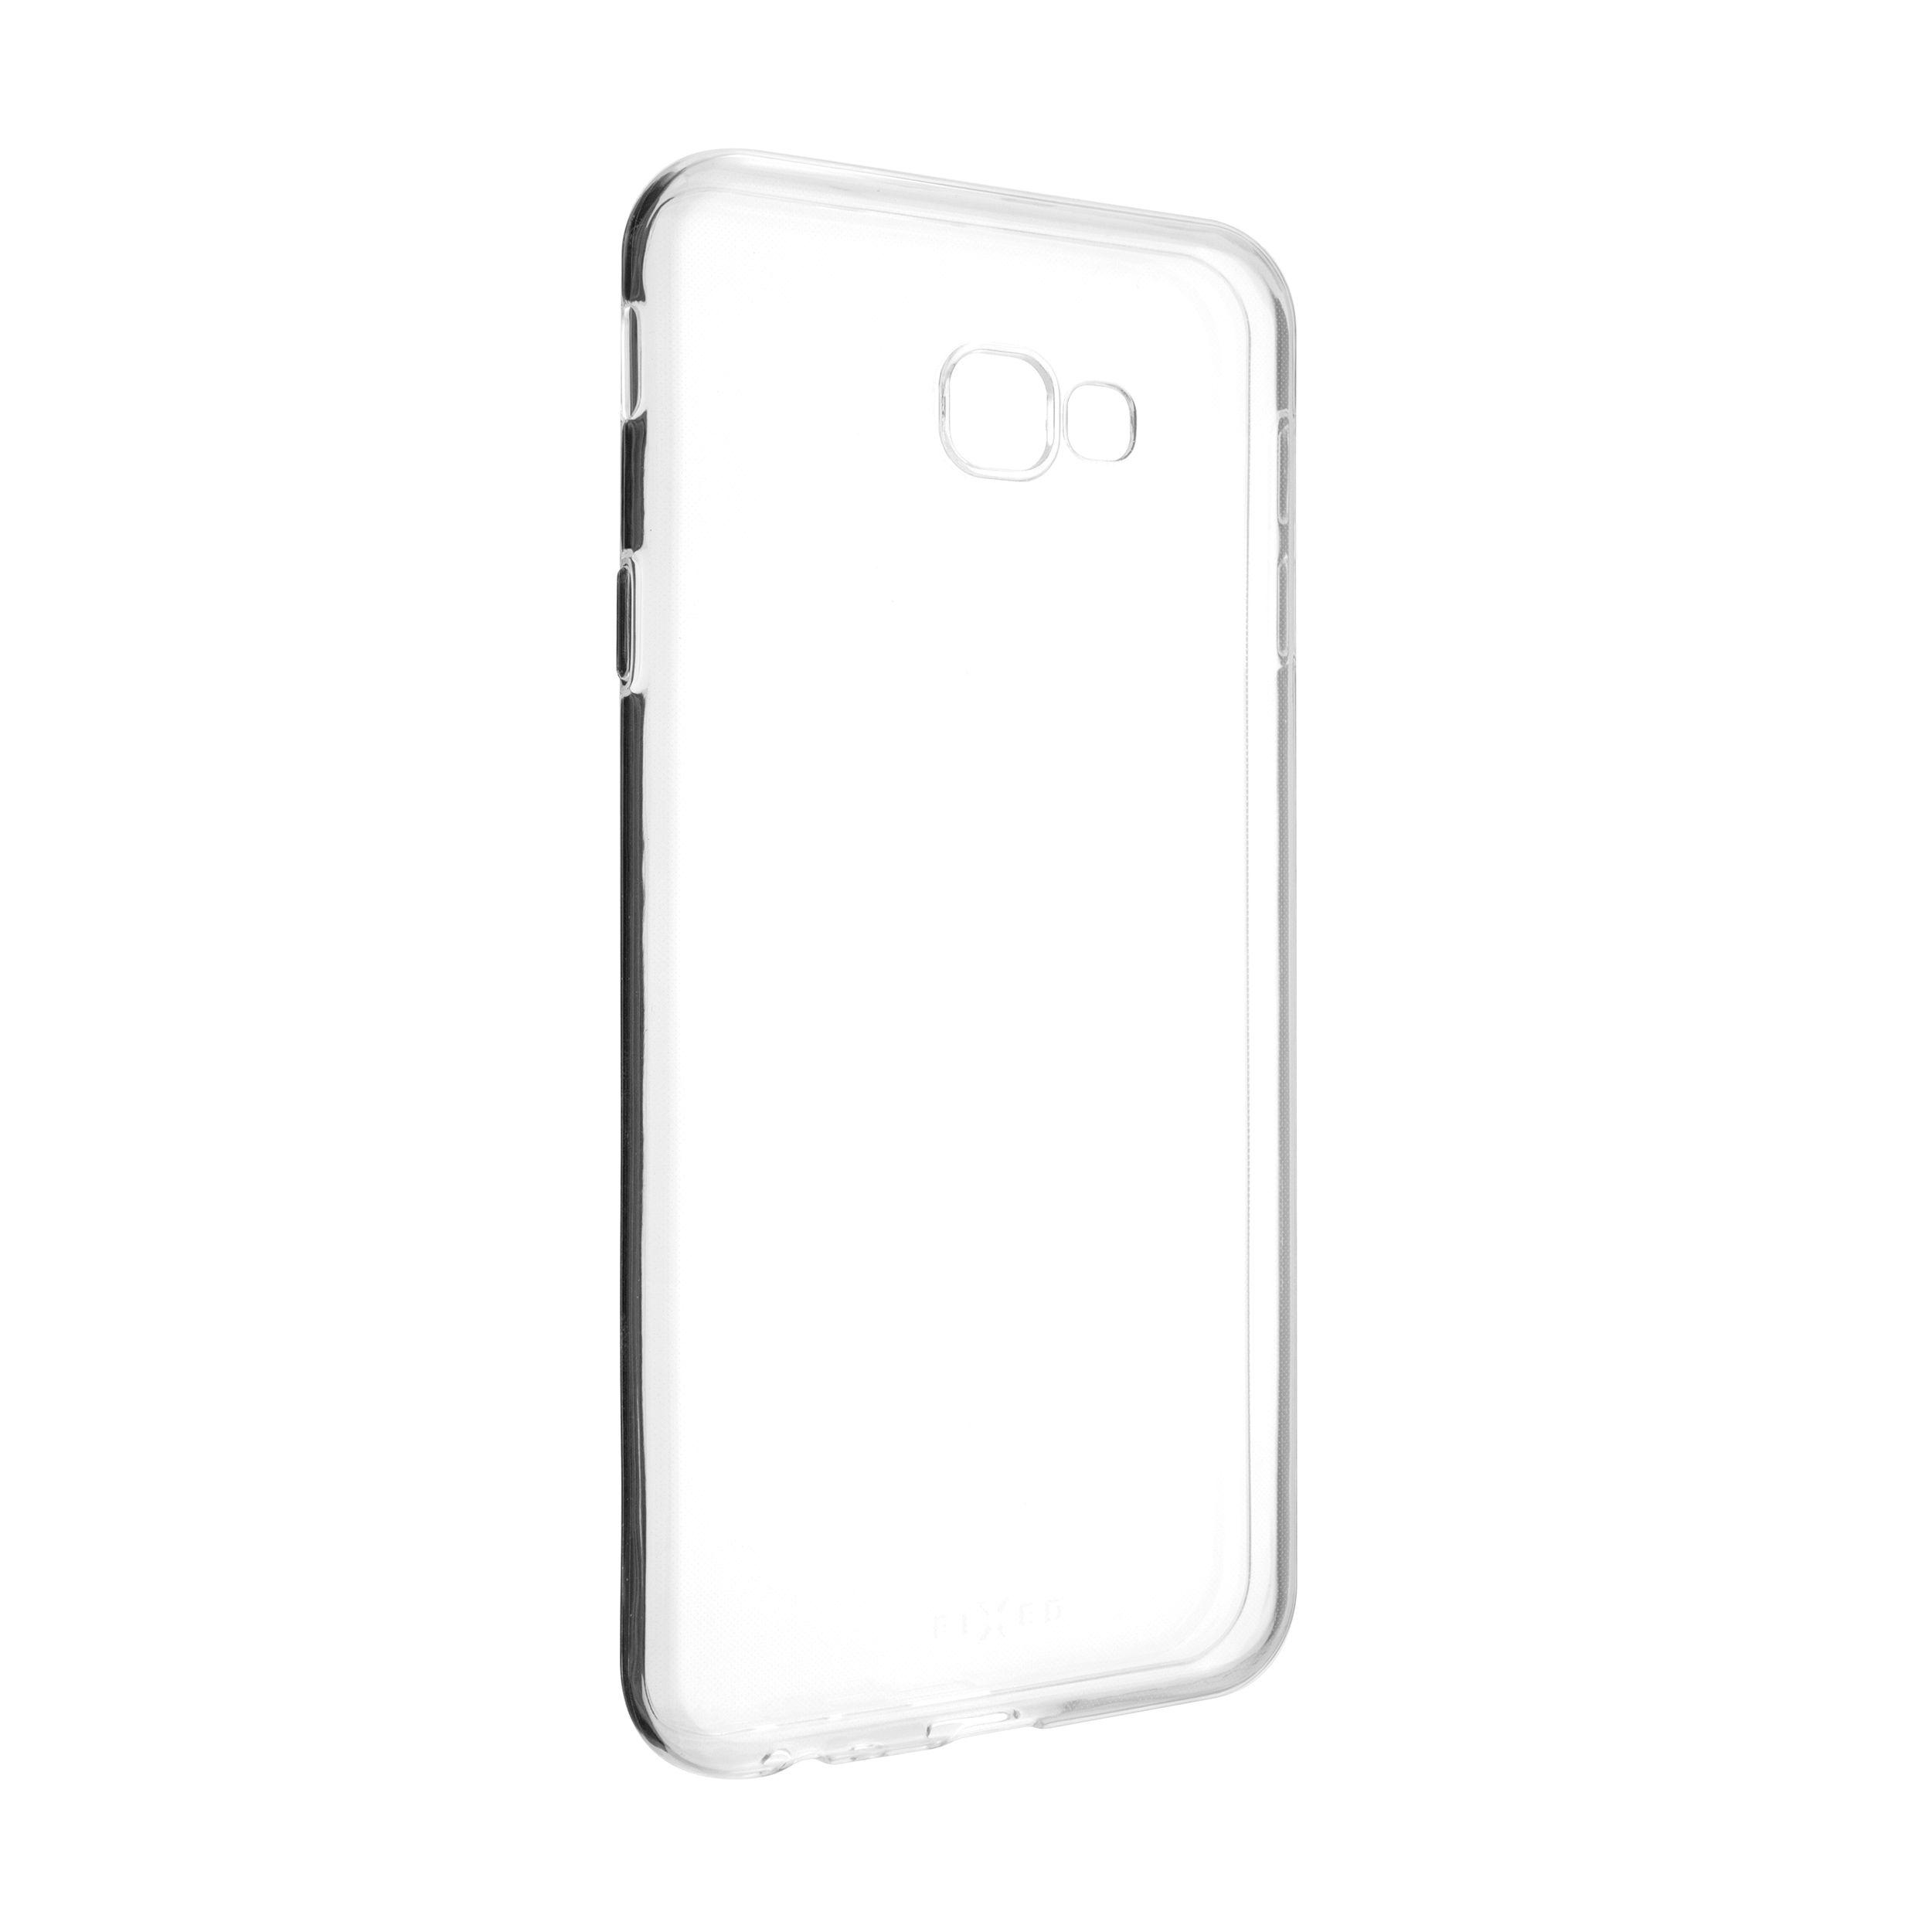 TPU gelové pouzdro FIXED pro Samsung Galaxy J4+, čiré